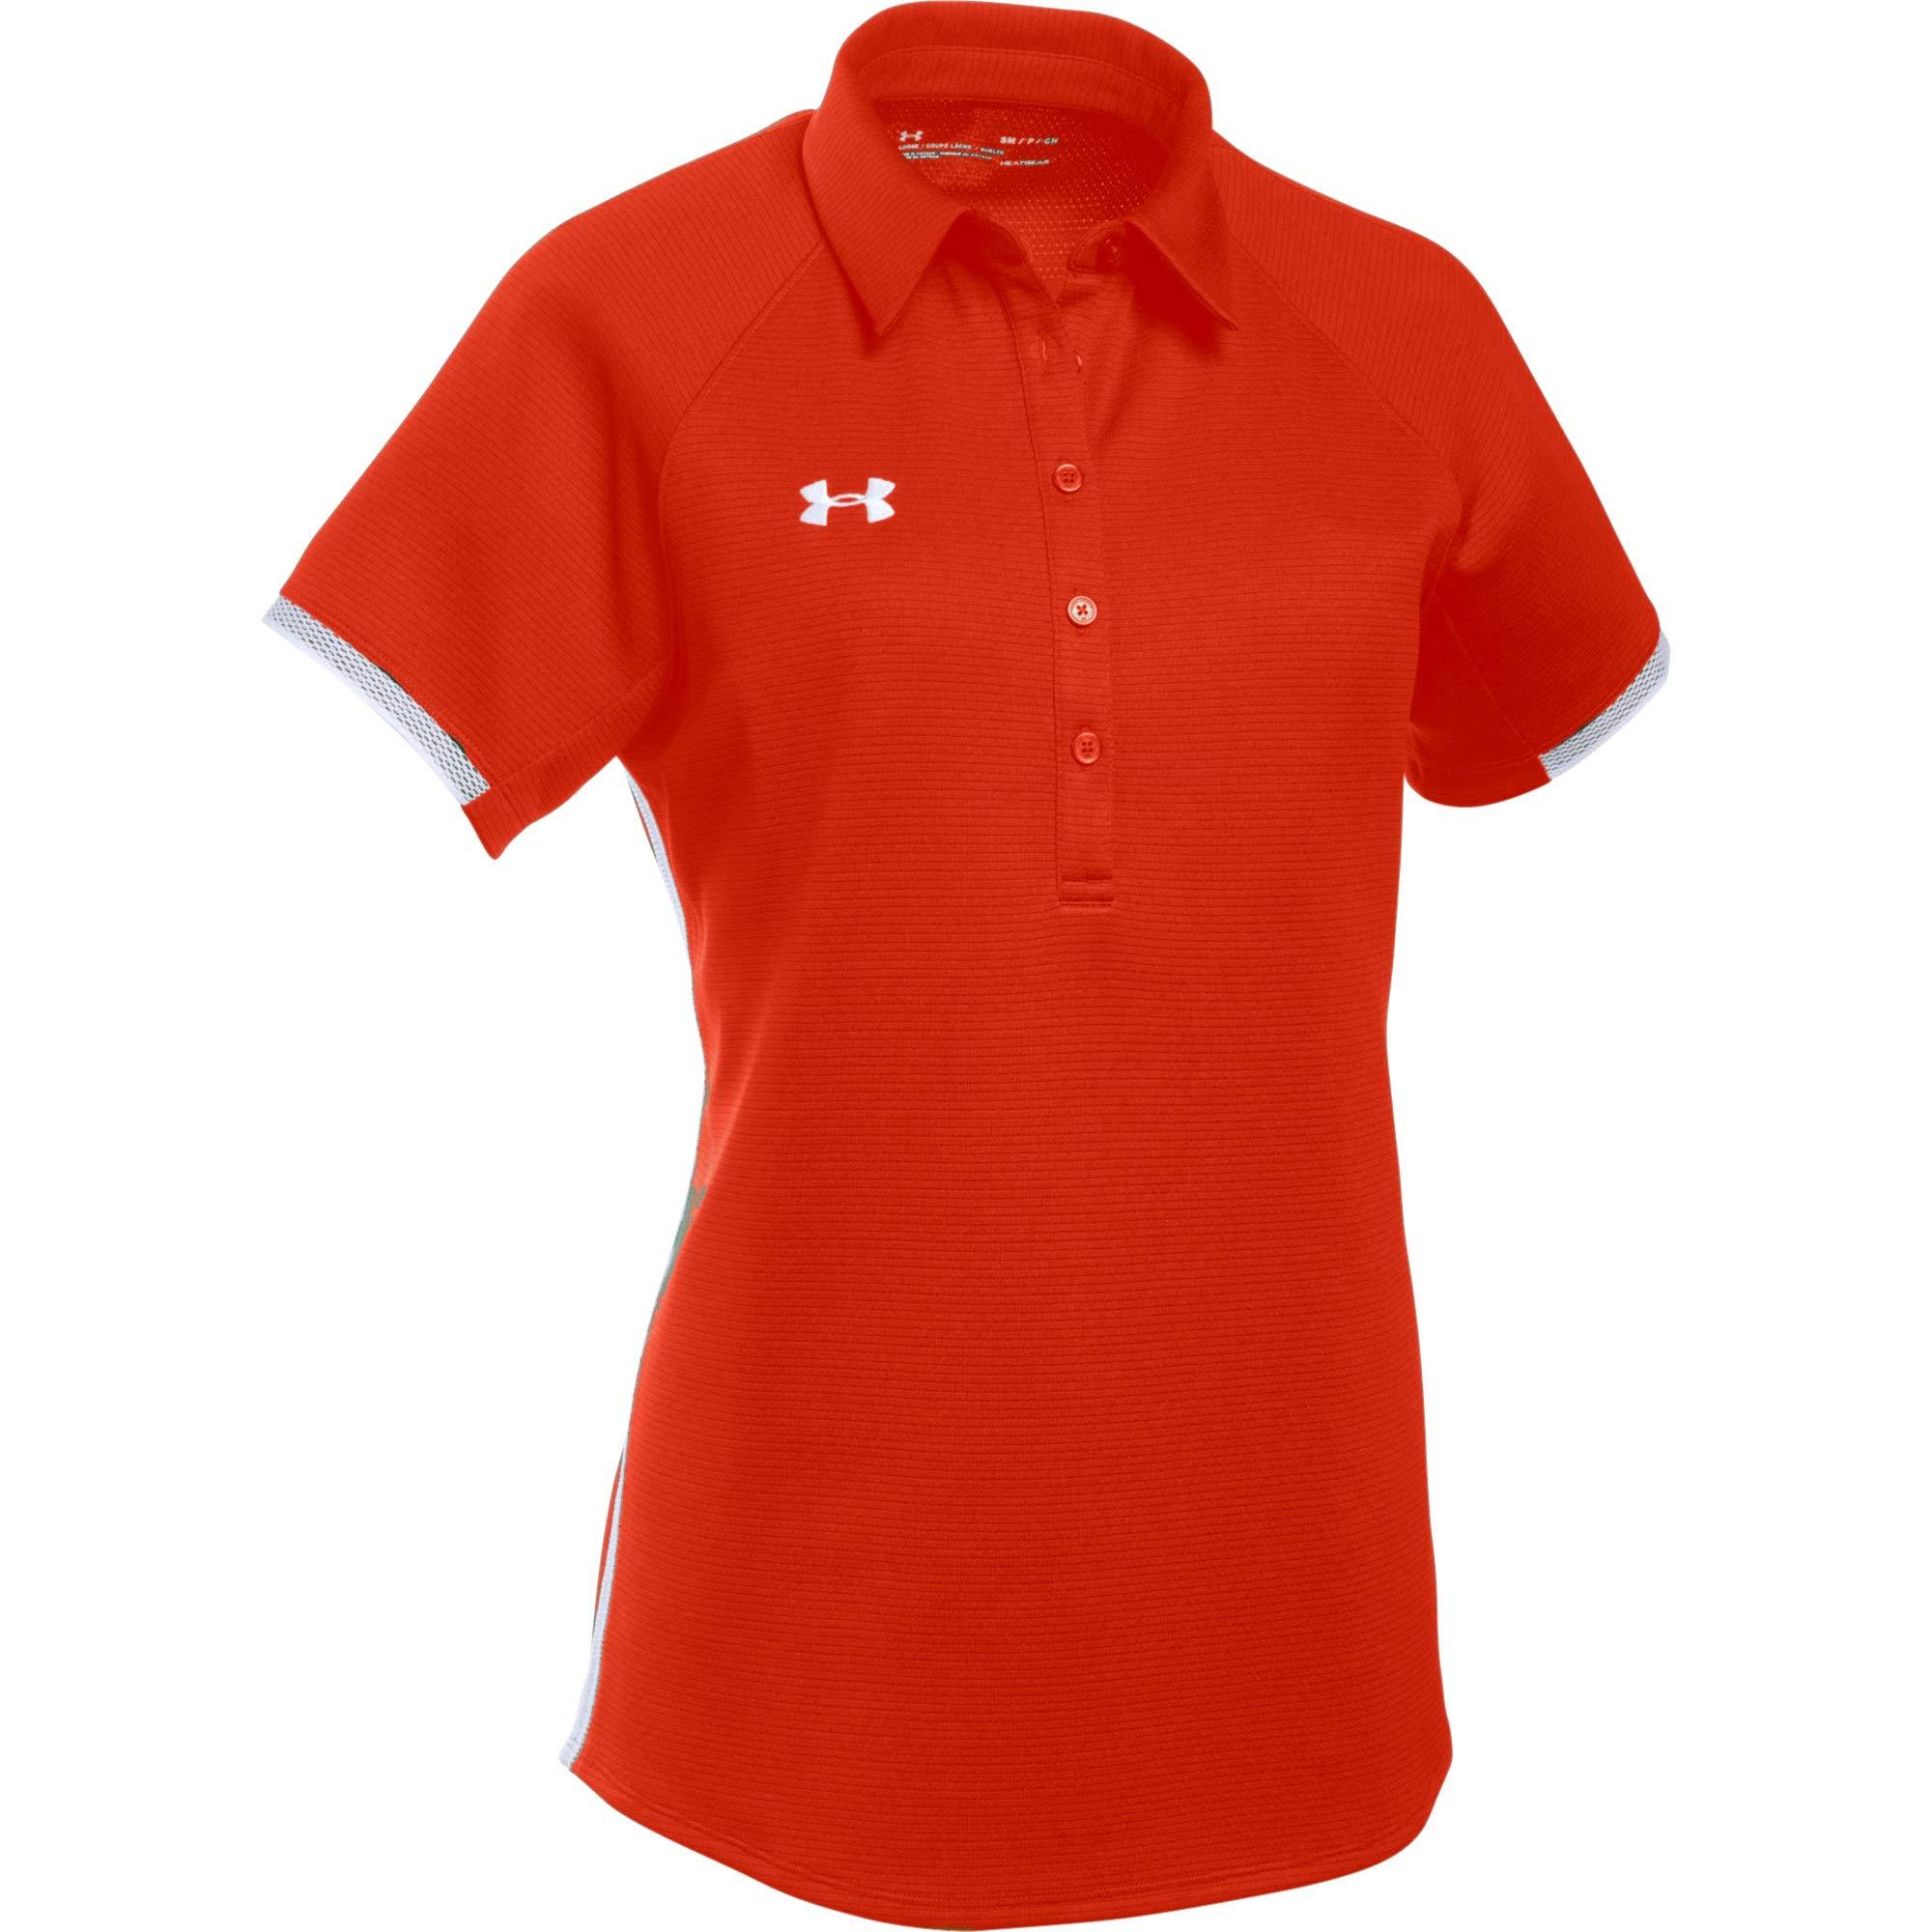 Under Armour Women's UA Rival Polo (Medium, Dark Orange-White) by Under Armour